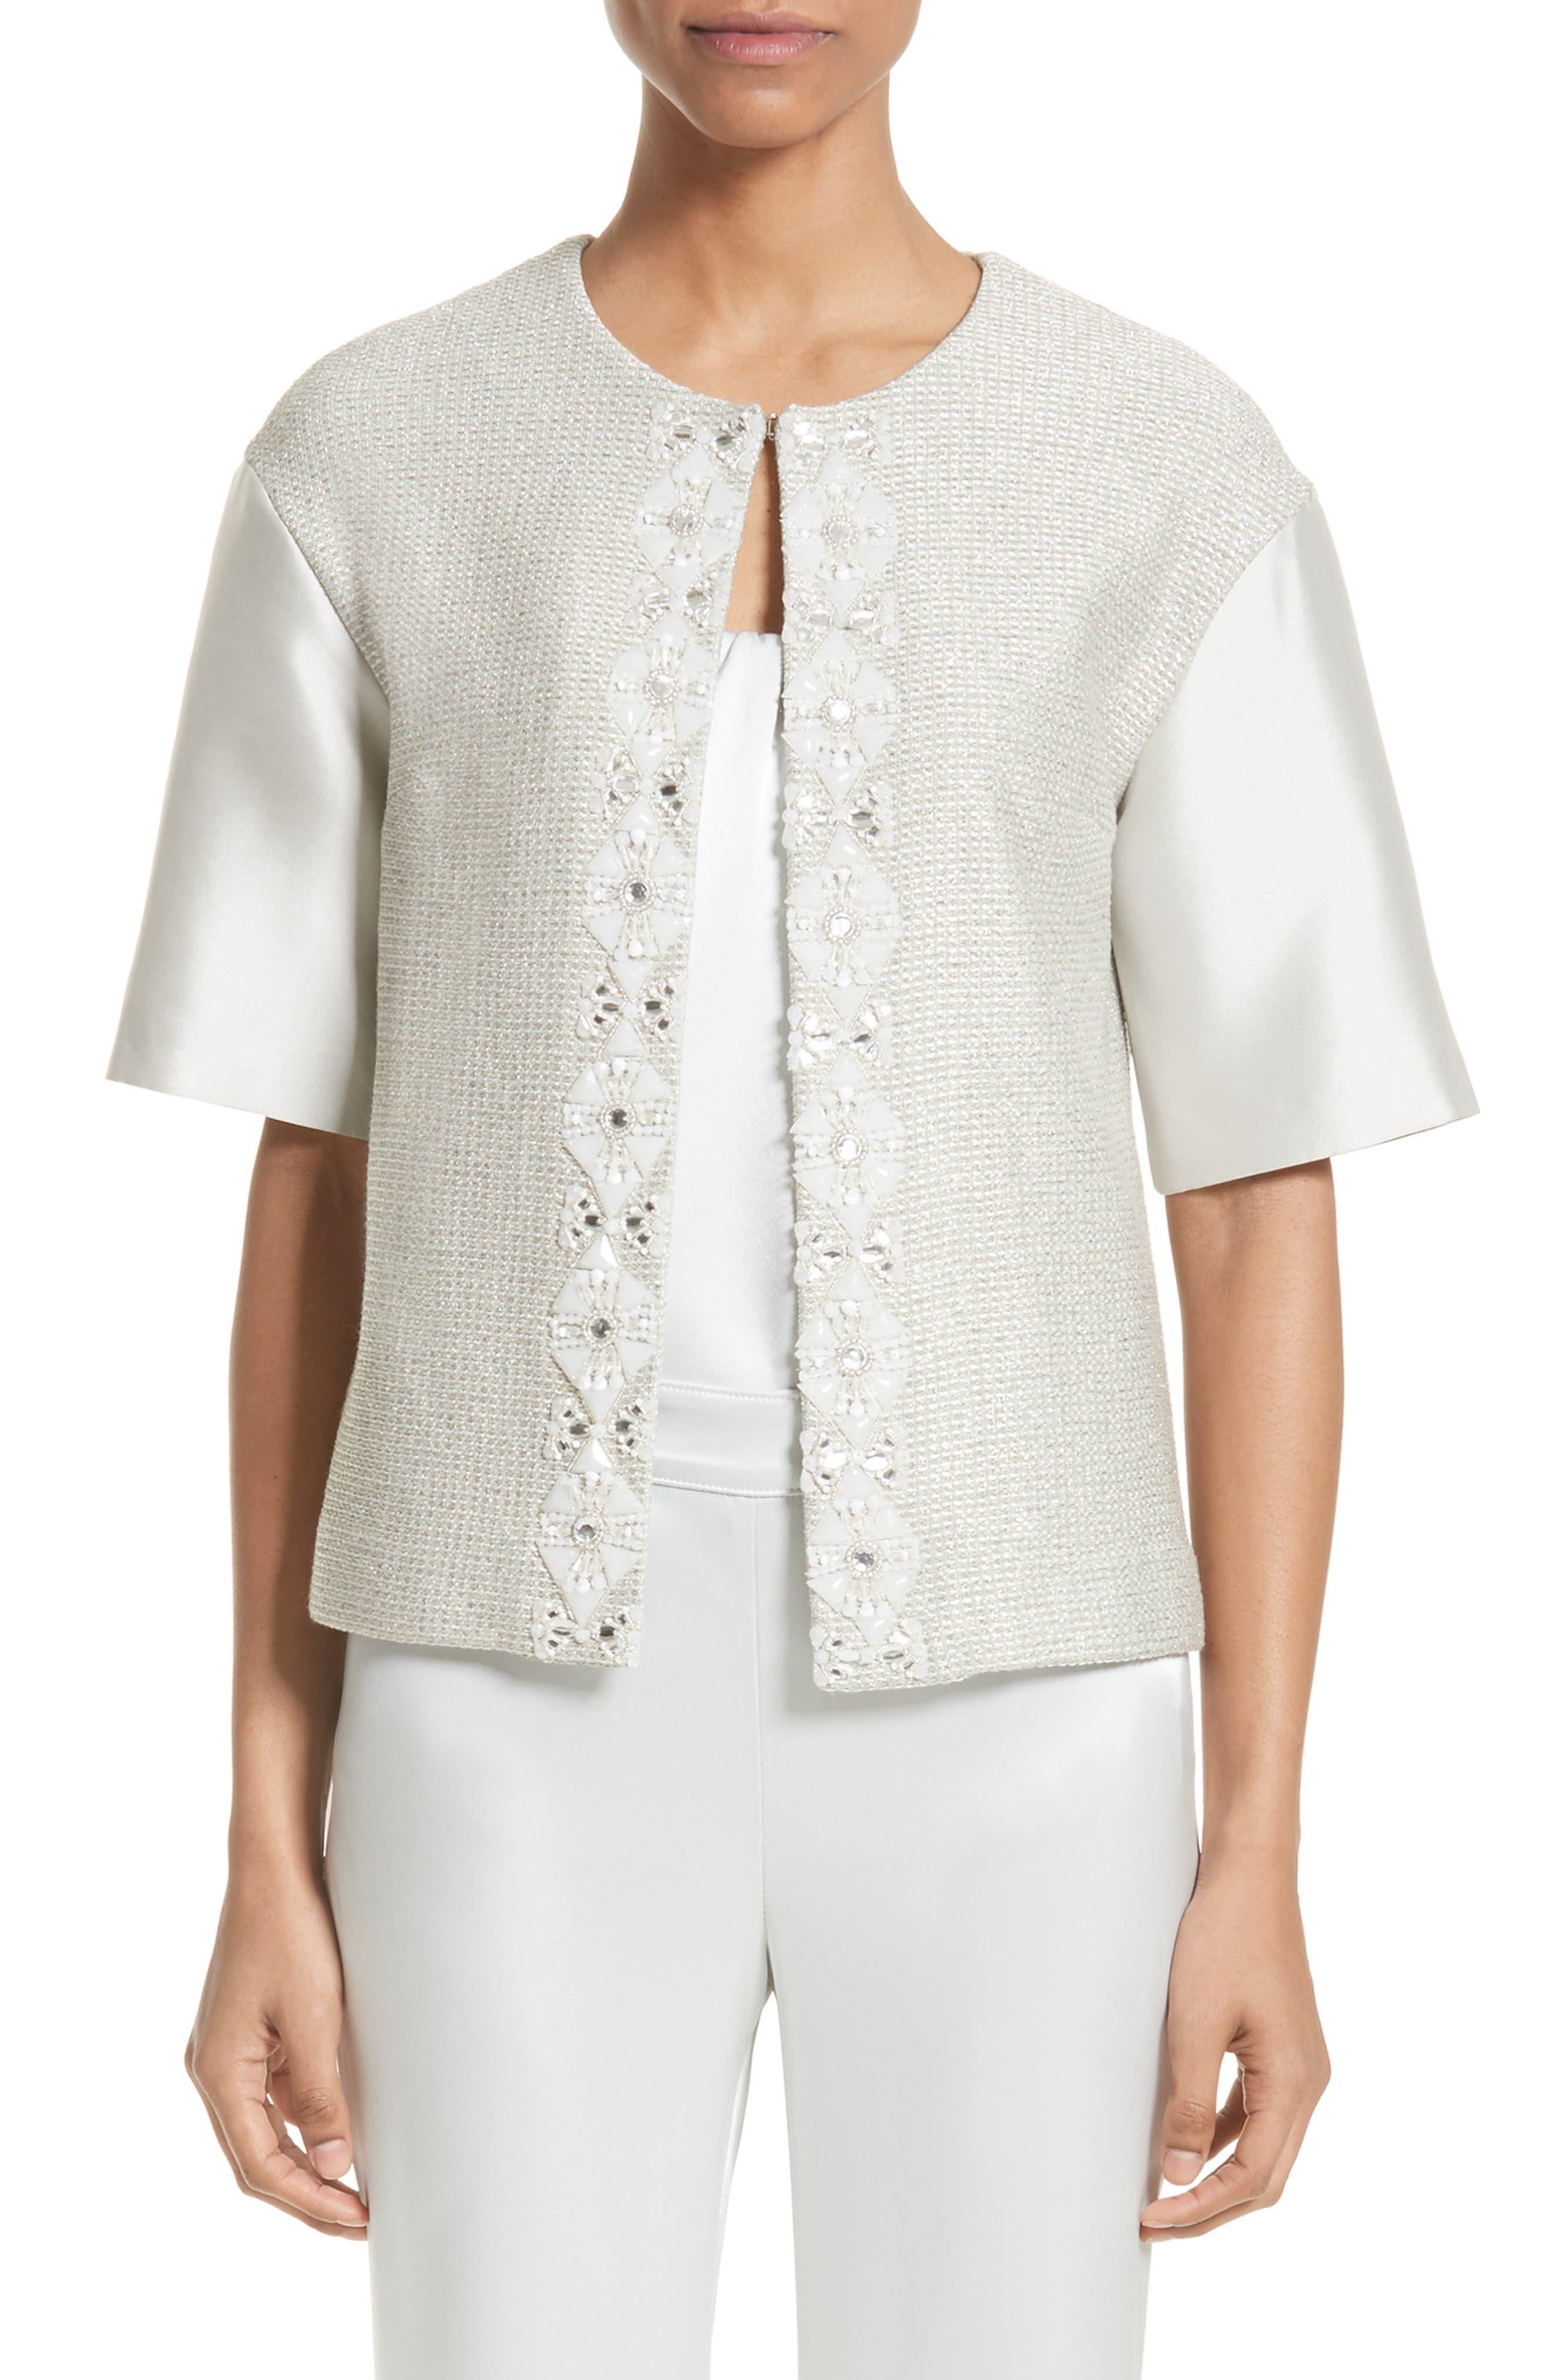 Main Image - St. John Collection Beaded Jasmine Sparkle Knit Jacket